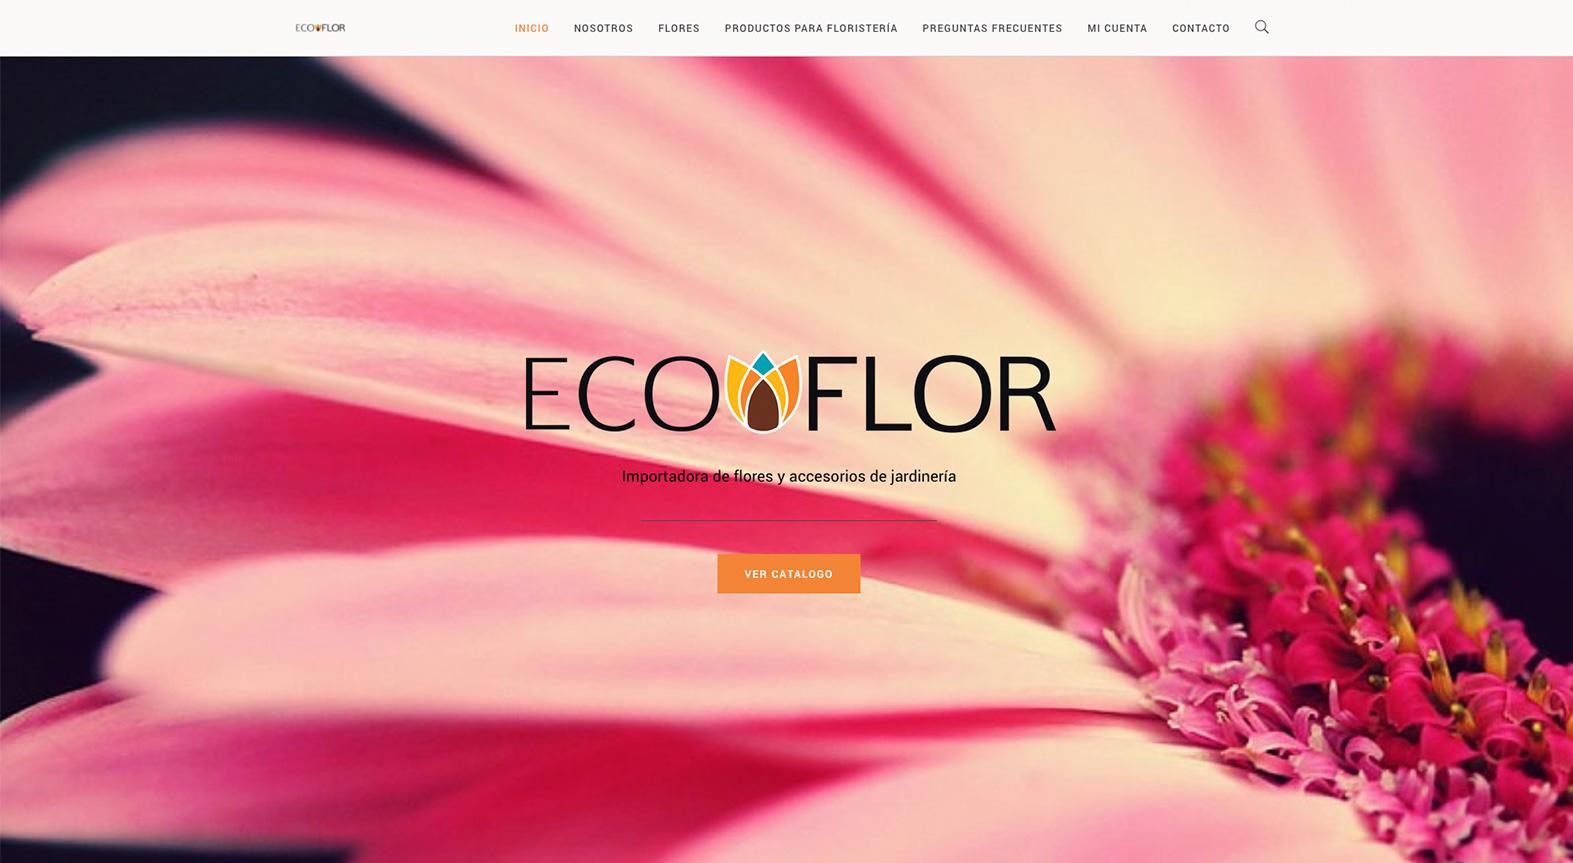 Ecoflor Distribuidora de Flores